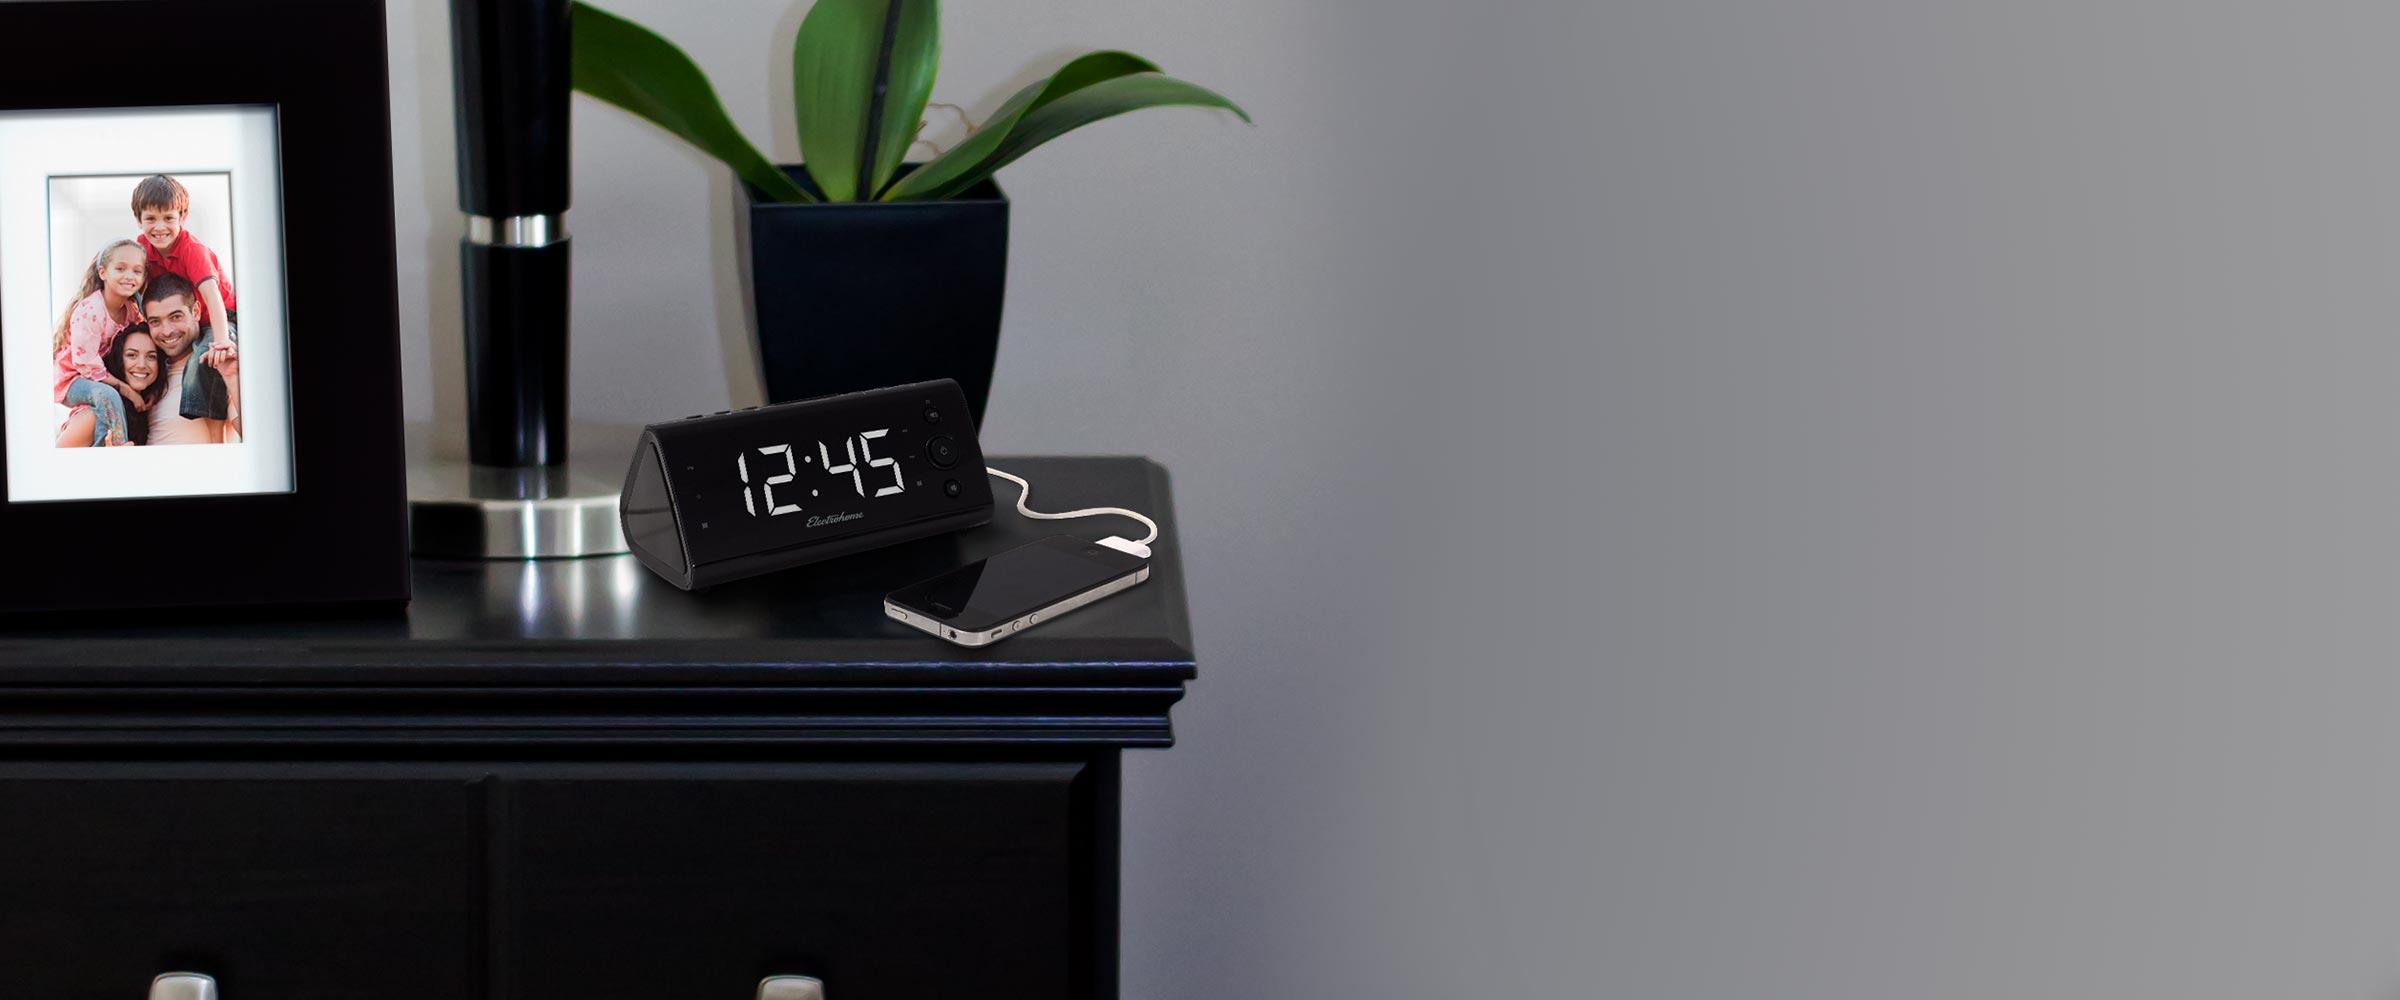 electrohome alarm clock instructions